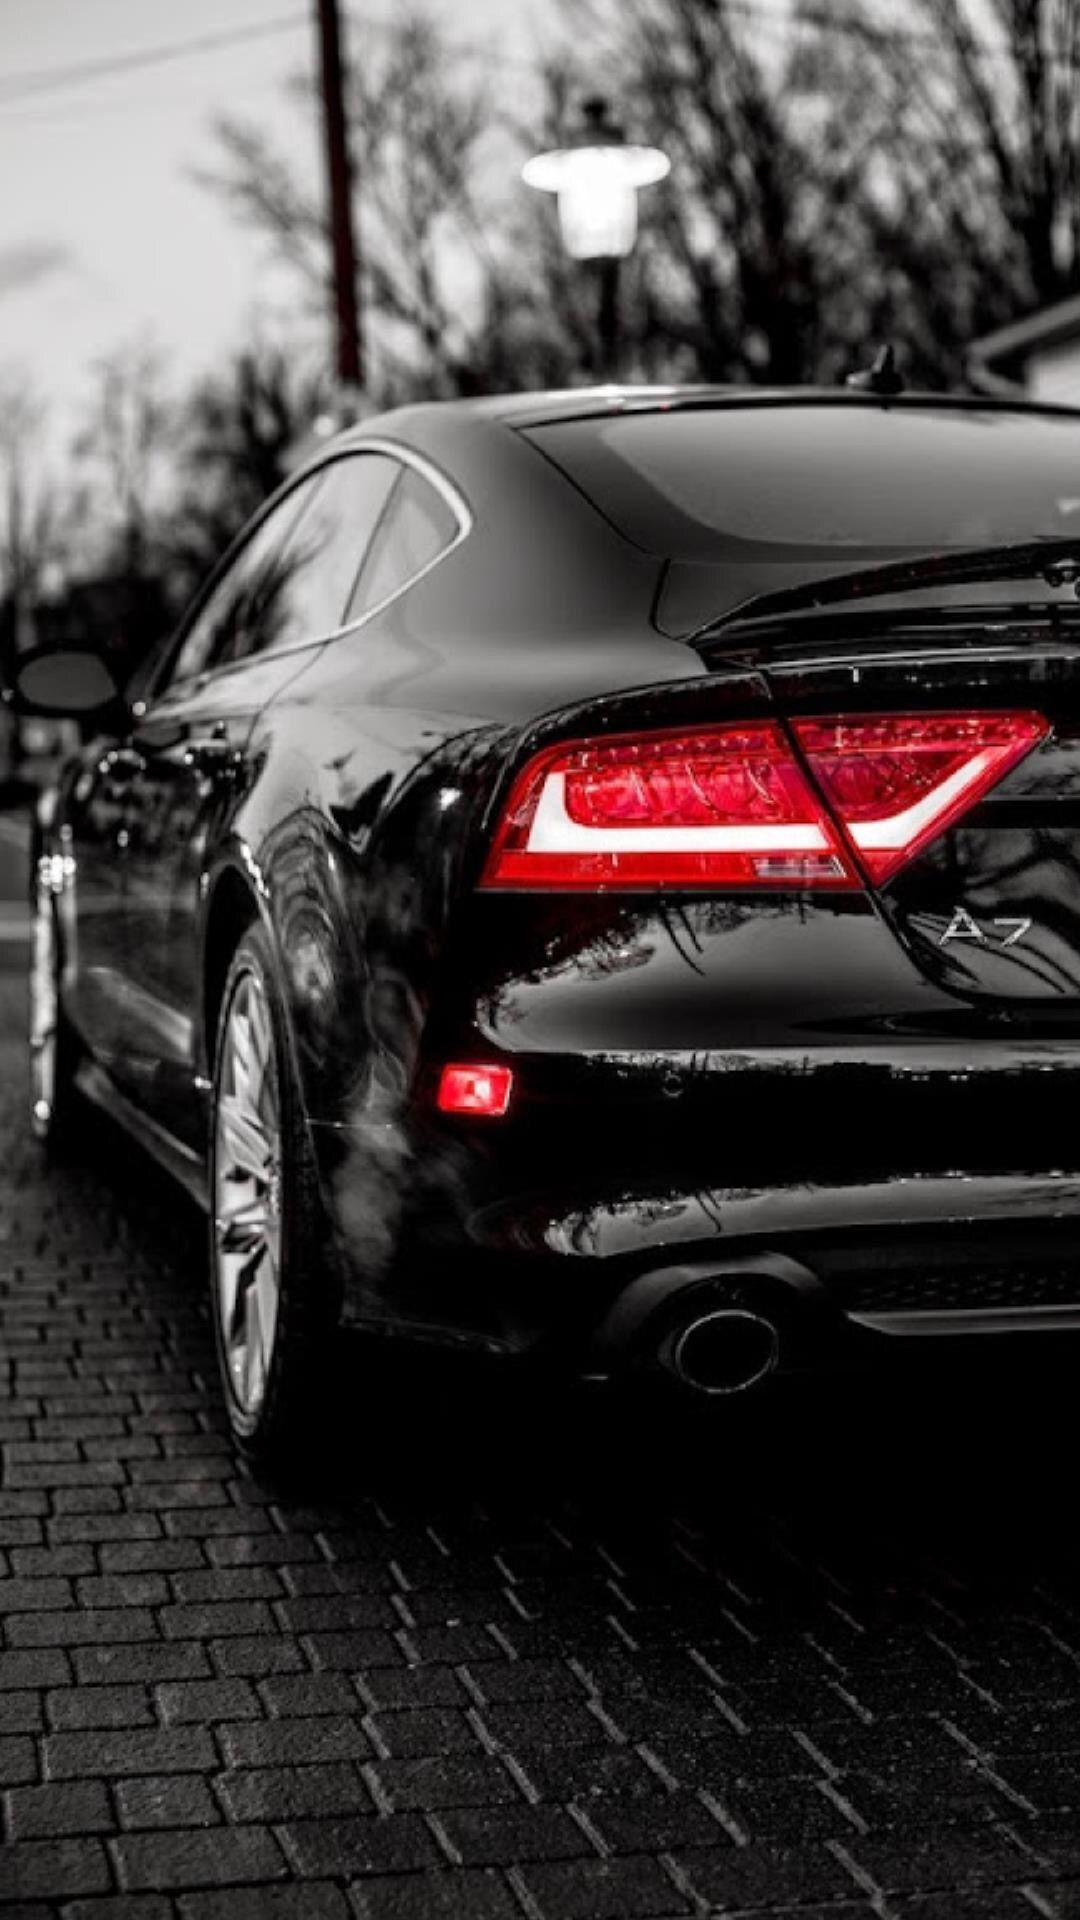 Audi A7 Wallpaper 4k 620x1102 Download Hd Wallpaper Wallpapertip